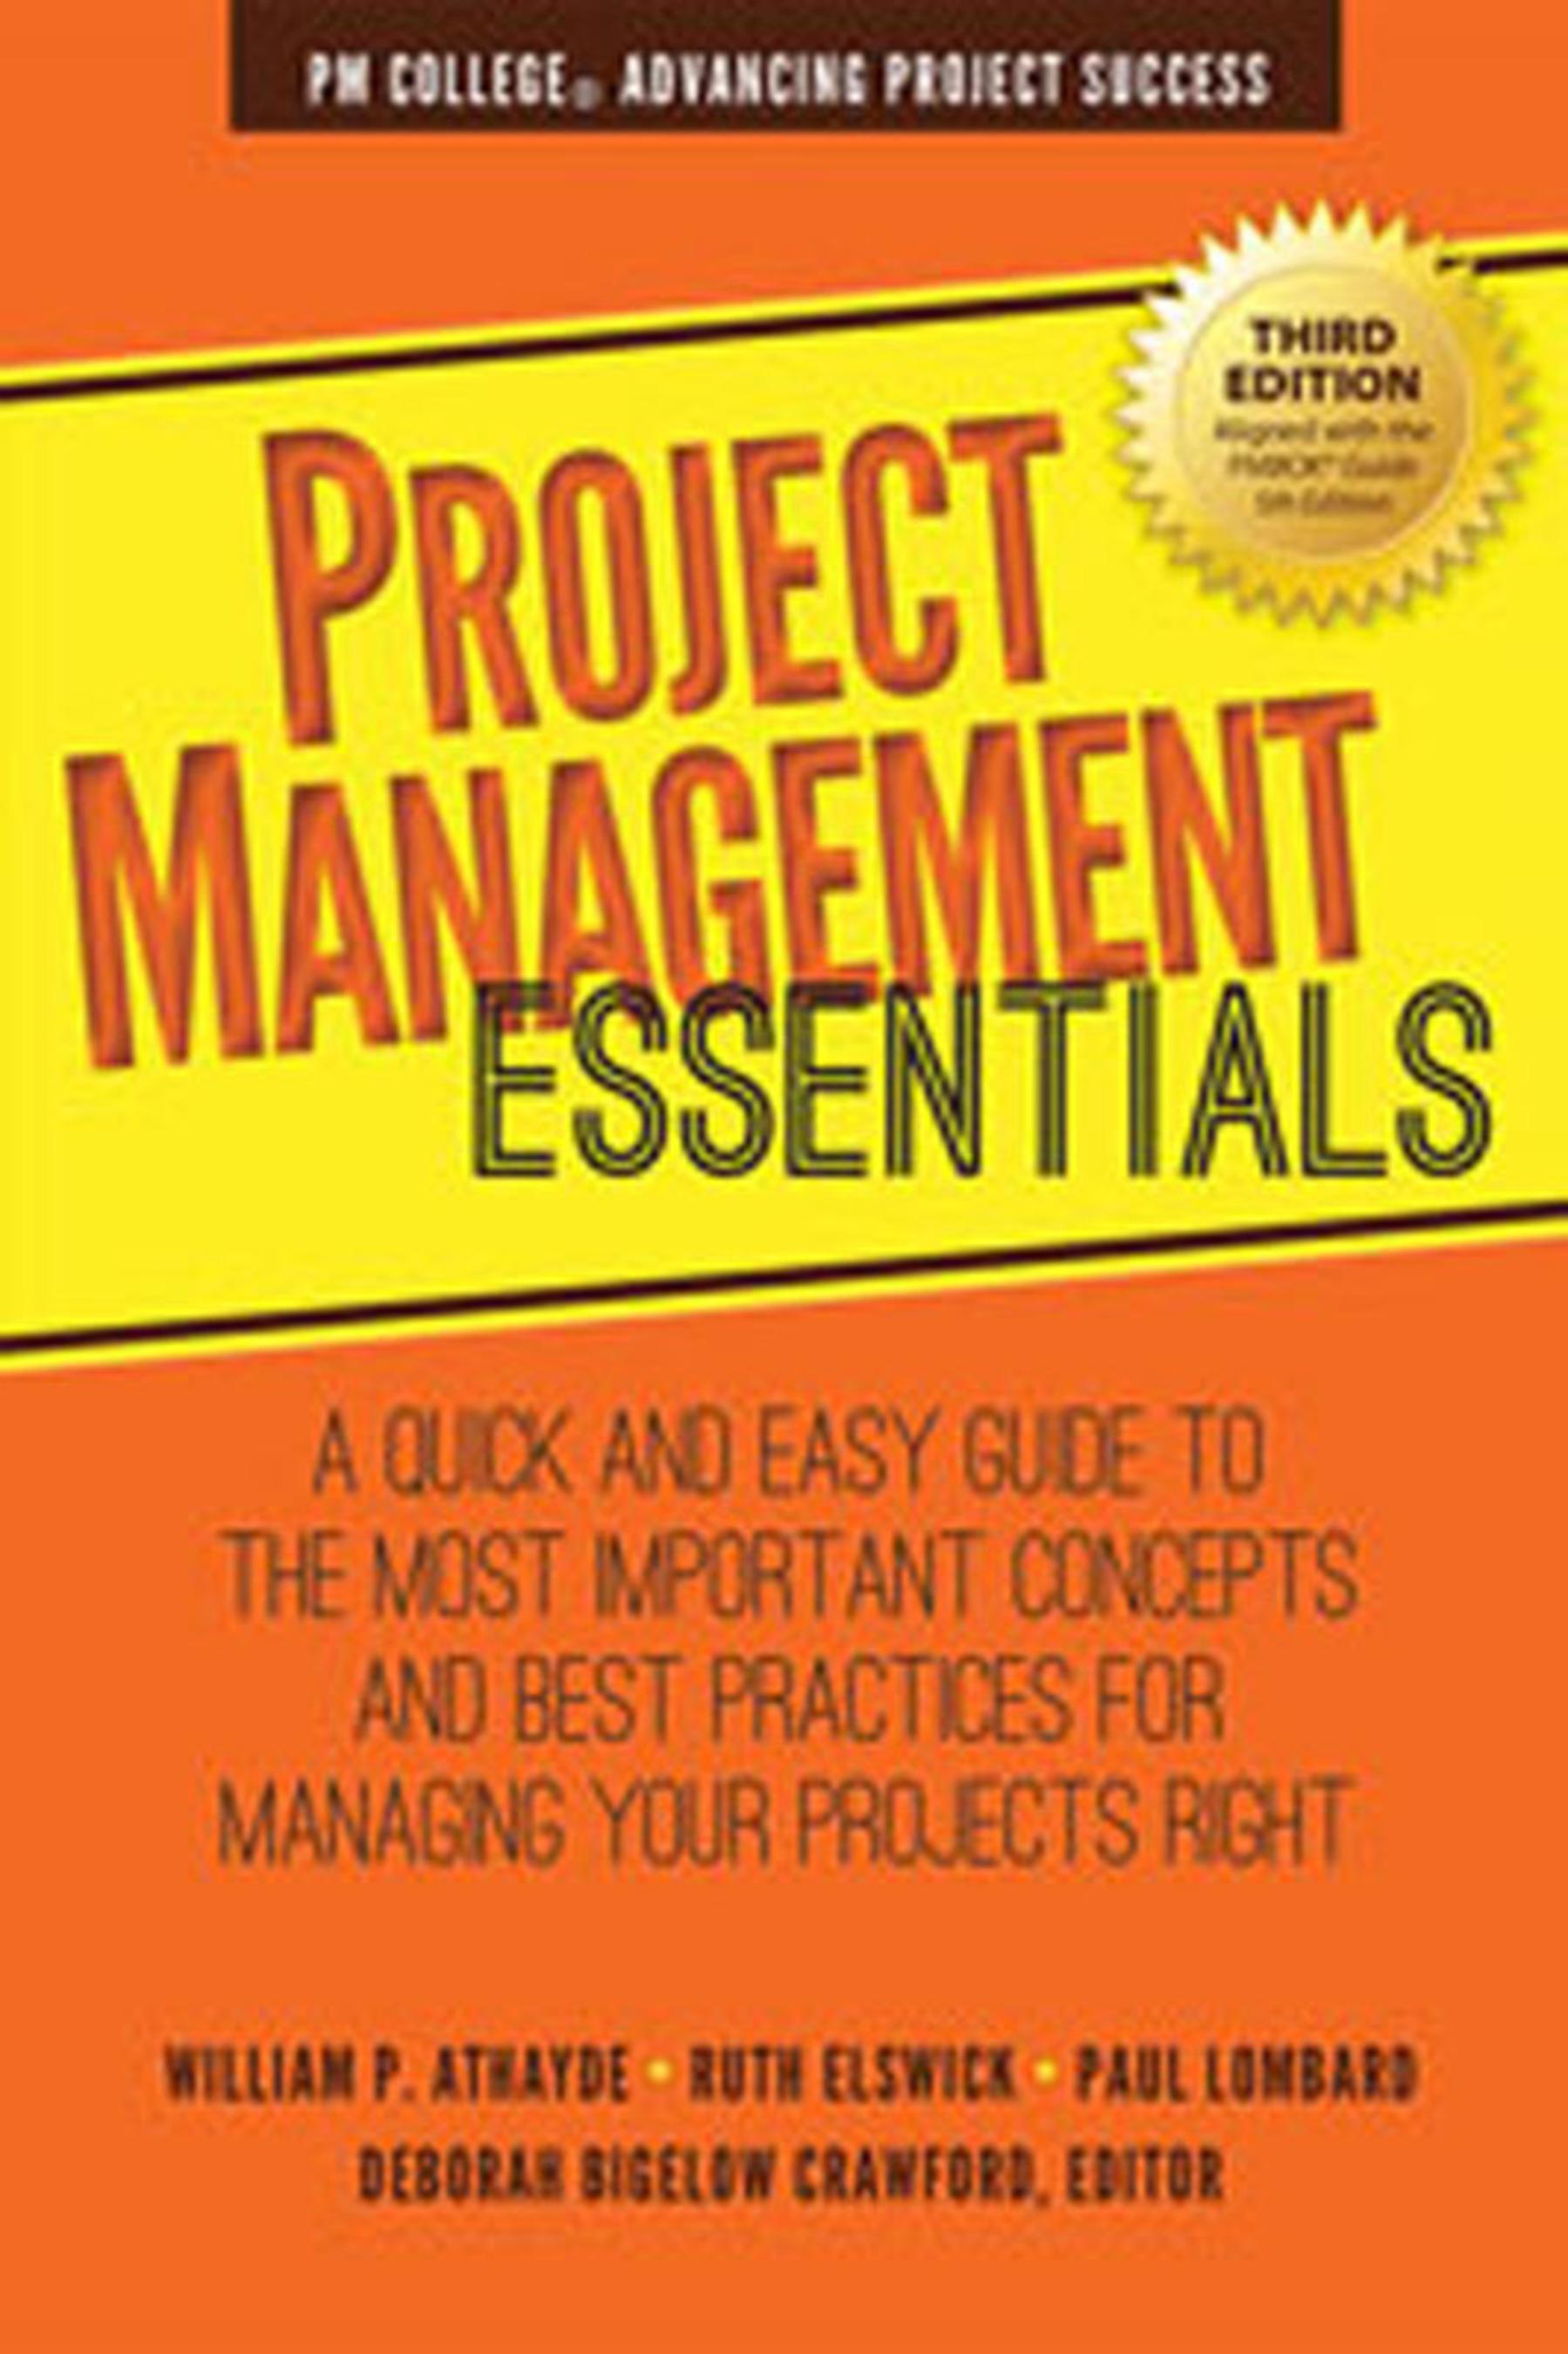 Project Management Essentials, Third Edition book cover.  (PRNewsFoto/Maven House Press)